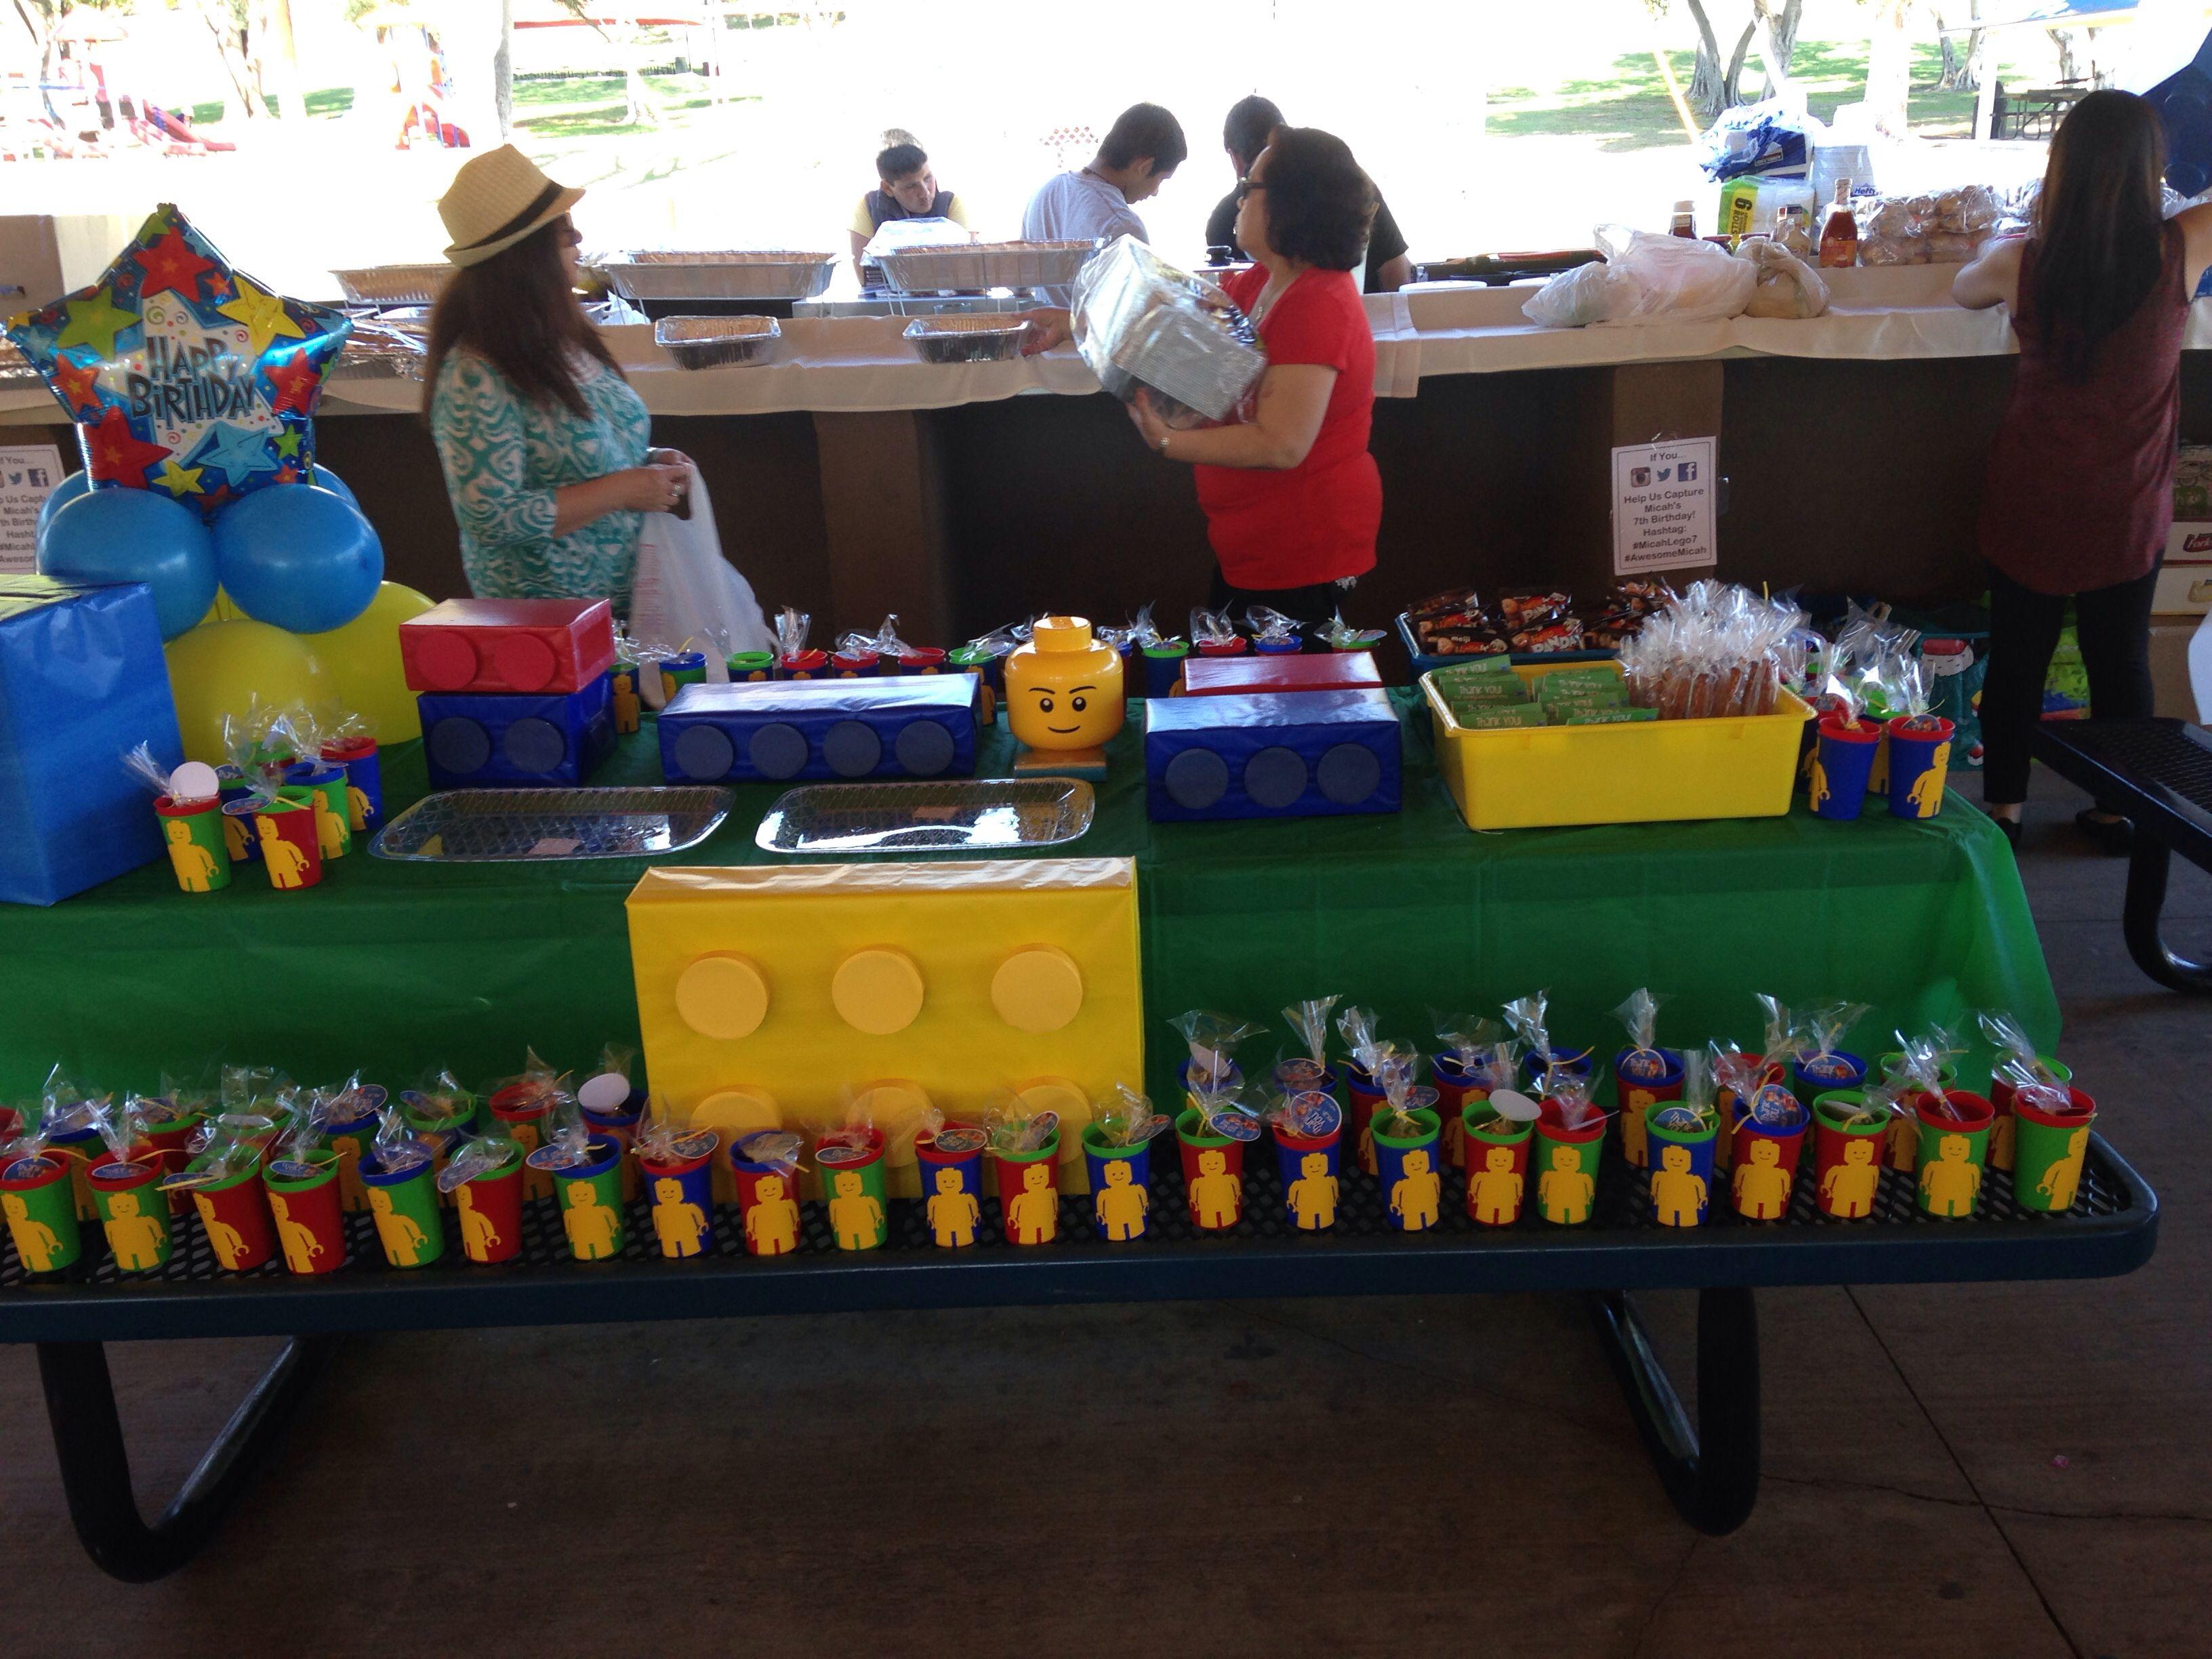 A Lego Themes Birthday Party For 7 Year Old Boy So Cute EverythingIsAwesome